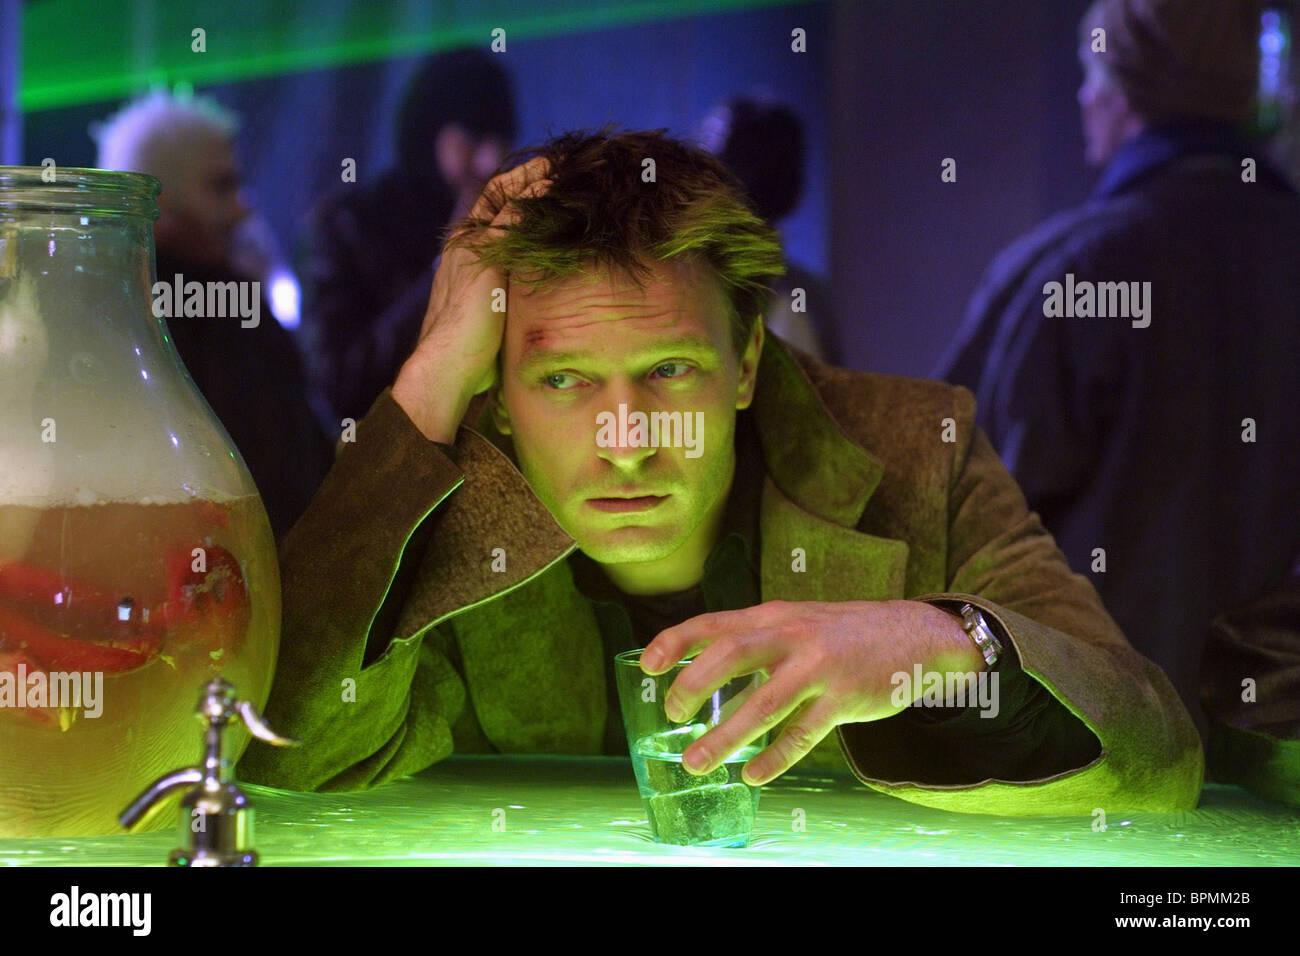 THOMAS KRETSCHMANN IMMORTAL; IMMORTEL (AD VITAM) (2004) - Stock Image